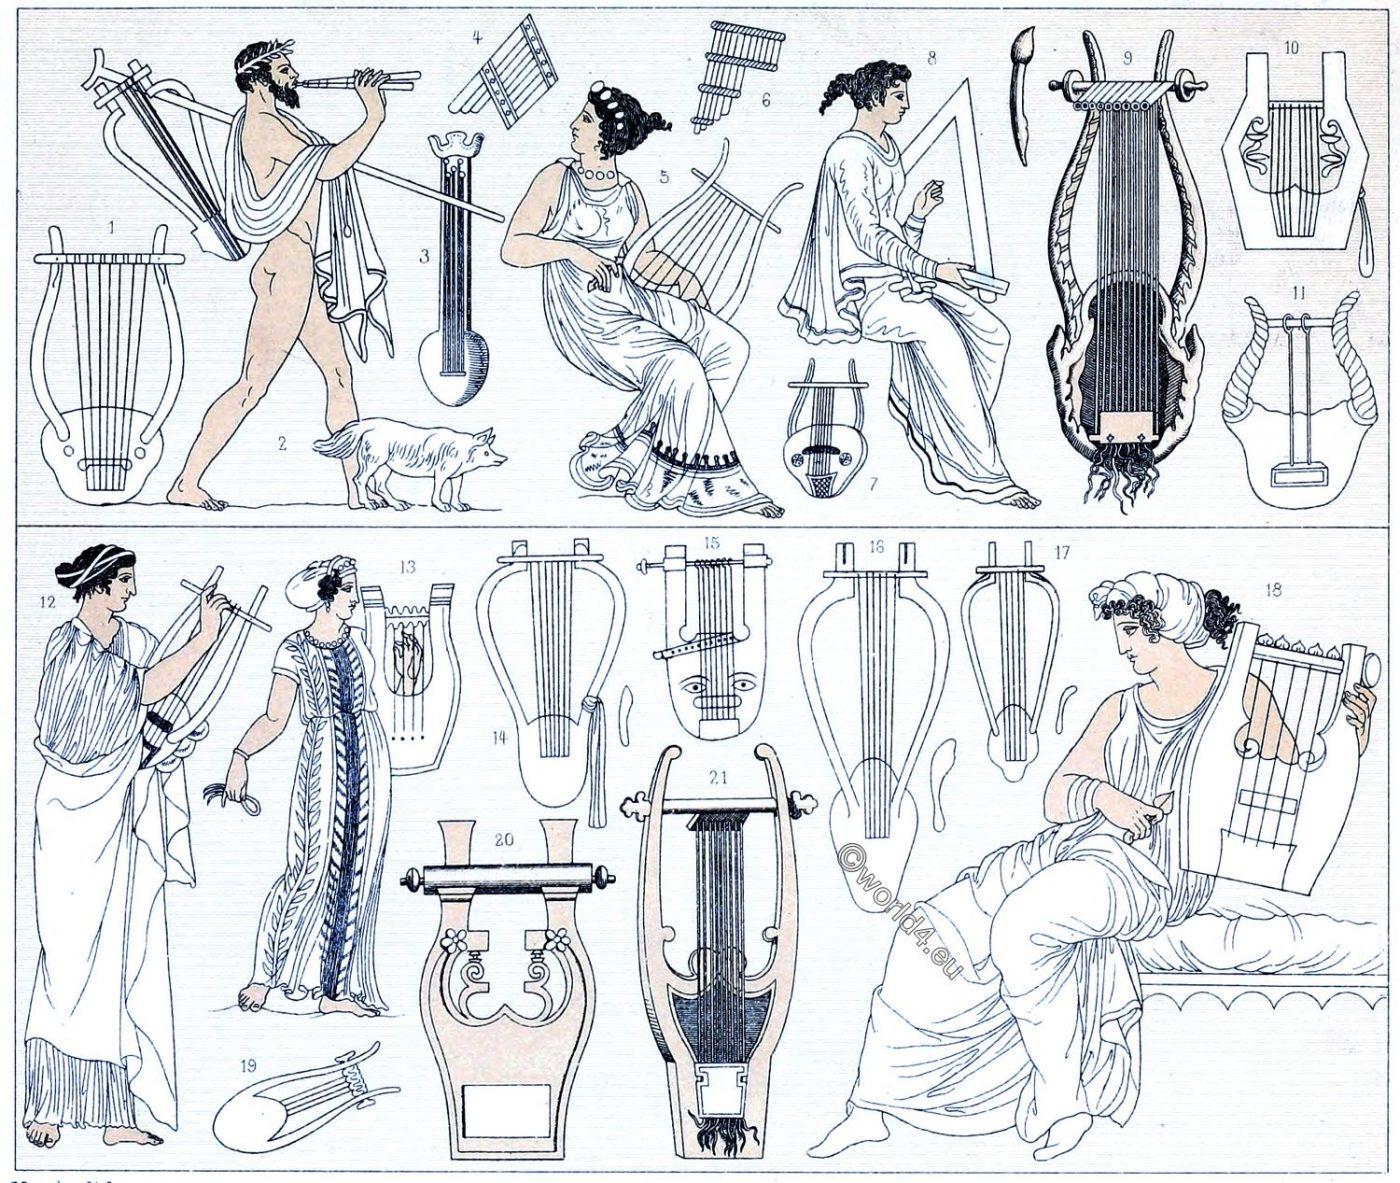 Lyras, lyre, flute, syrinx, pan flute, Ancient, Greece, Greek, musical instruments,